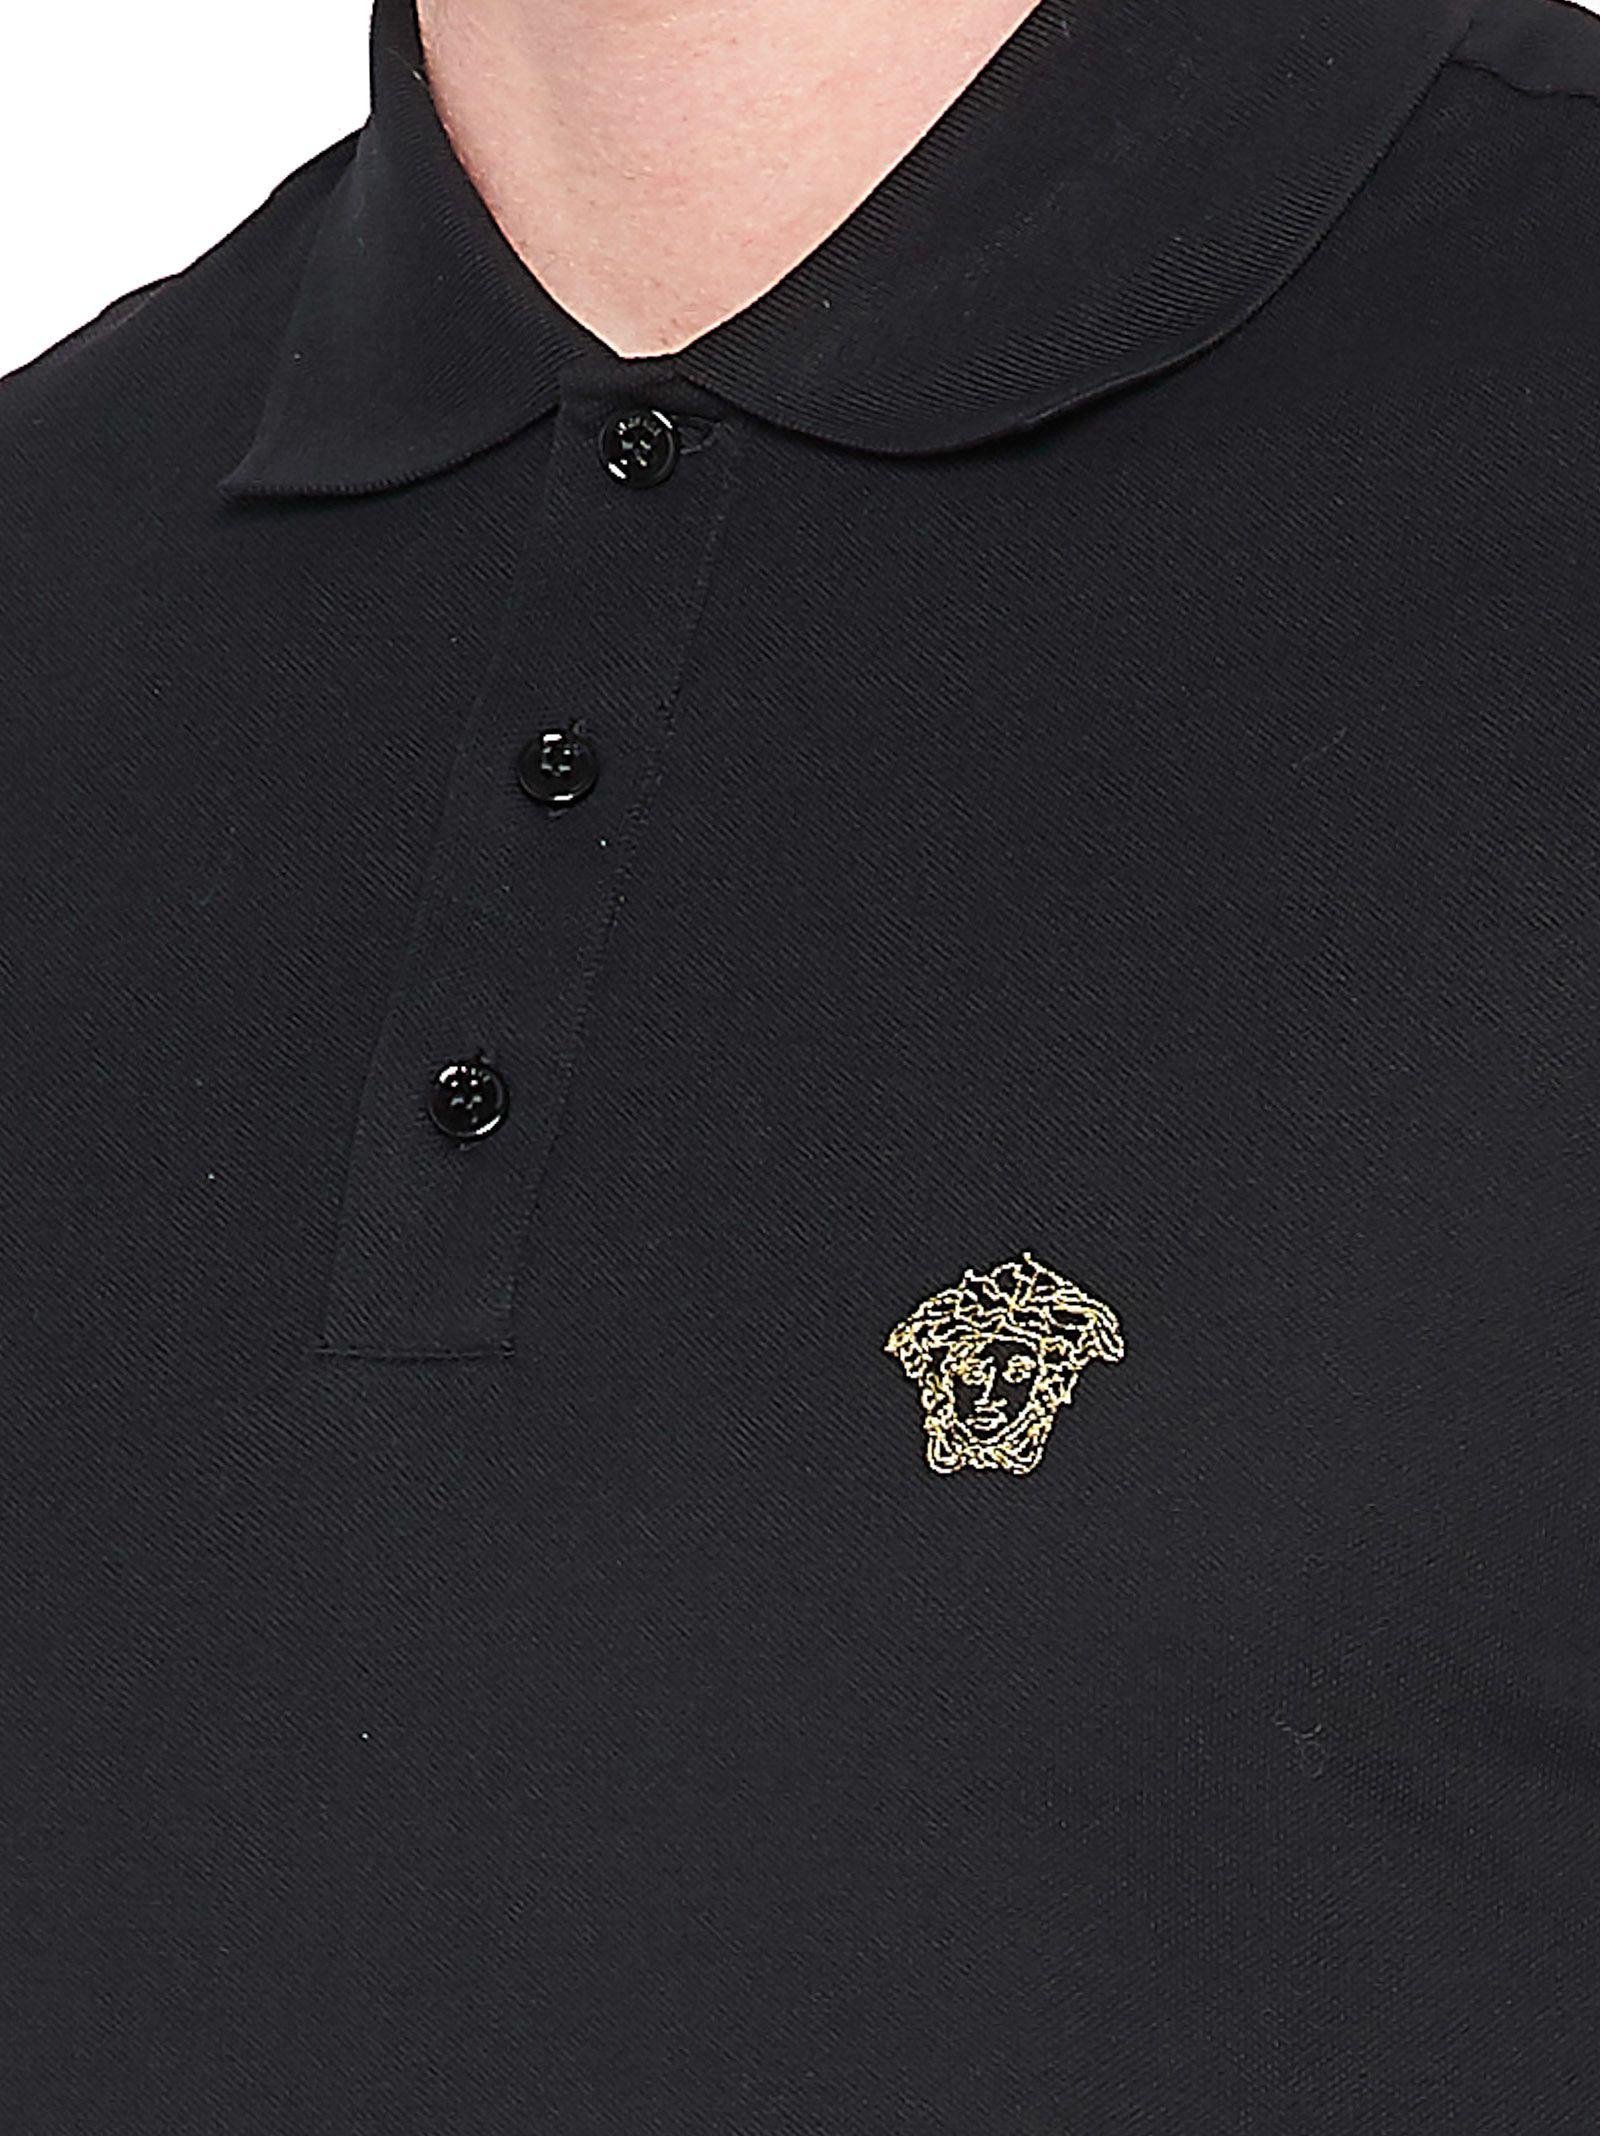 Black Versace Polo